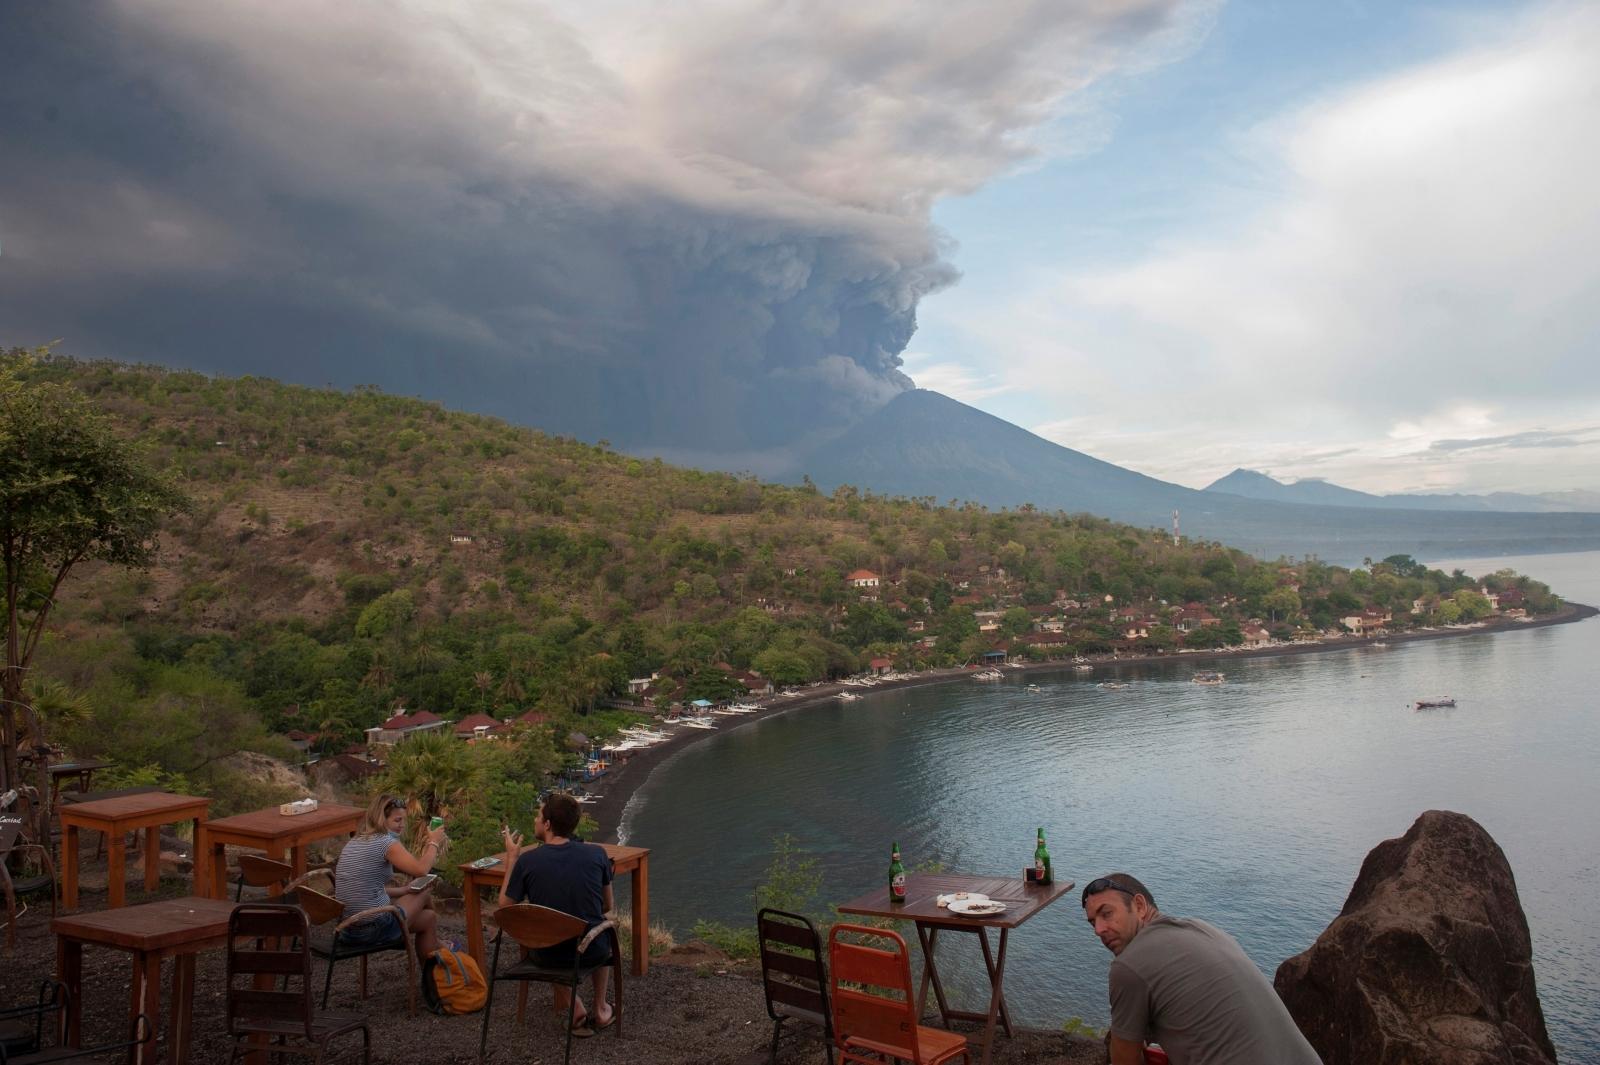 Mount Agung volcano, Bali